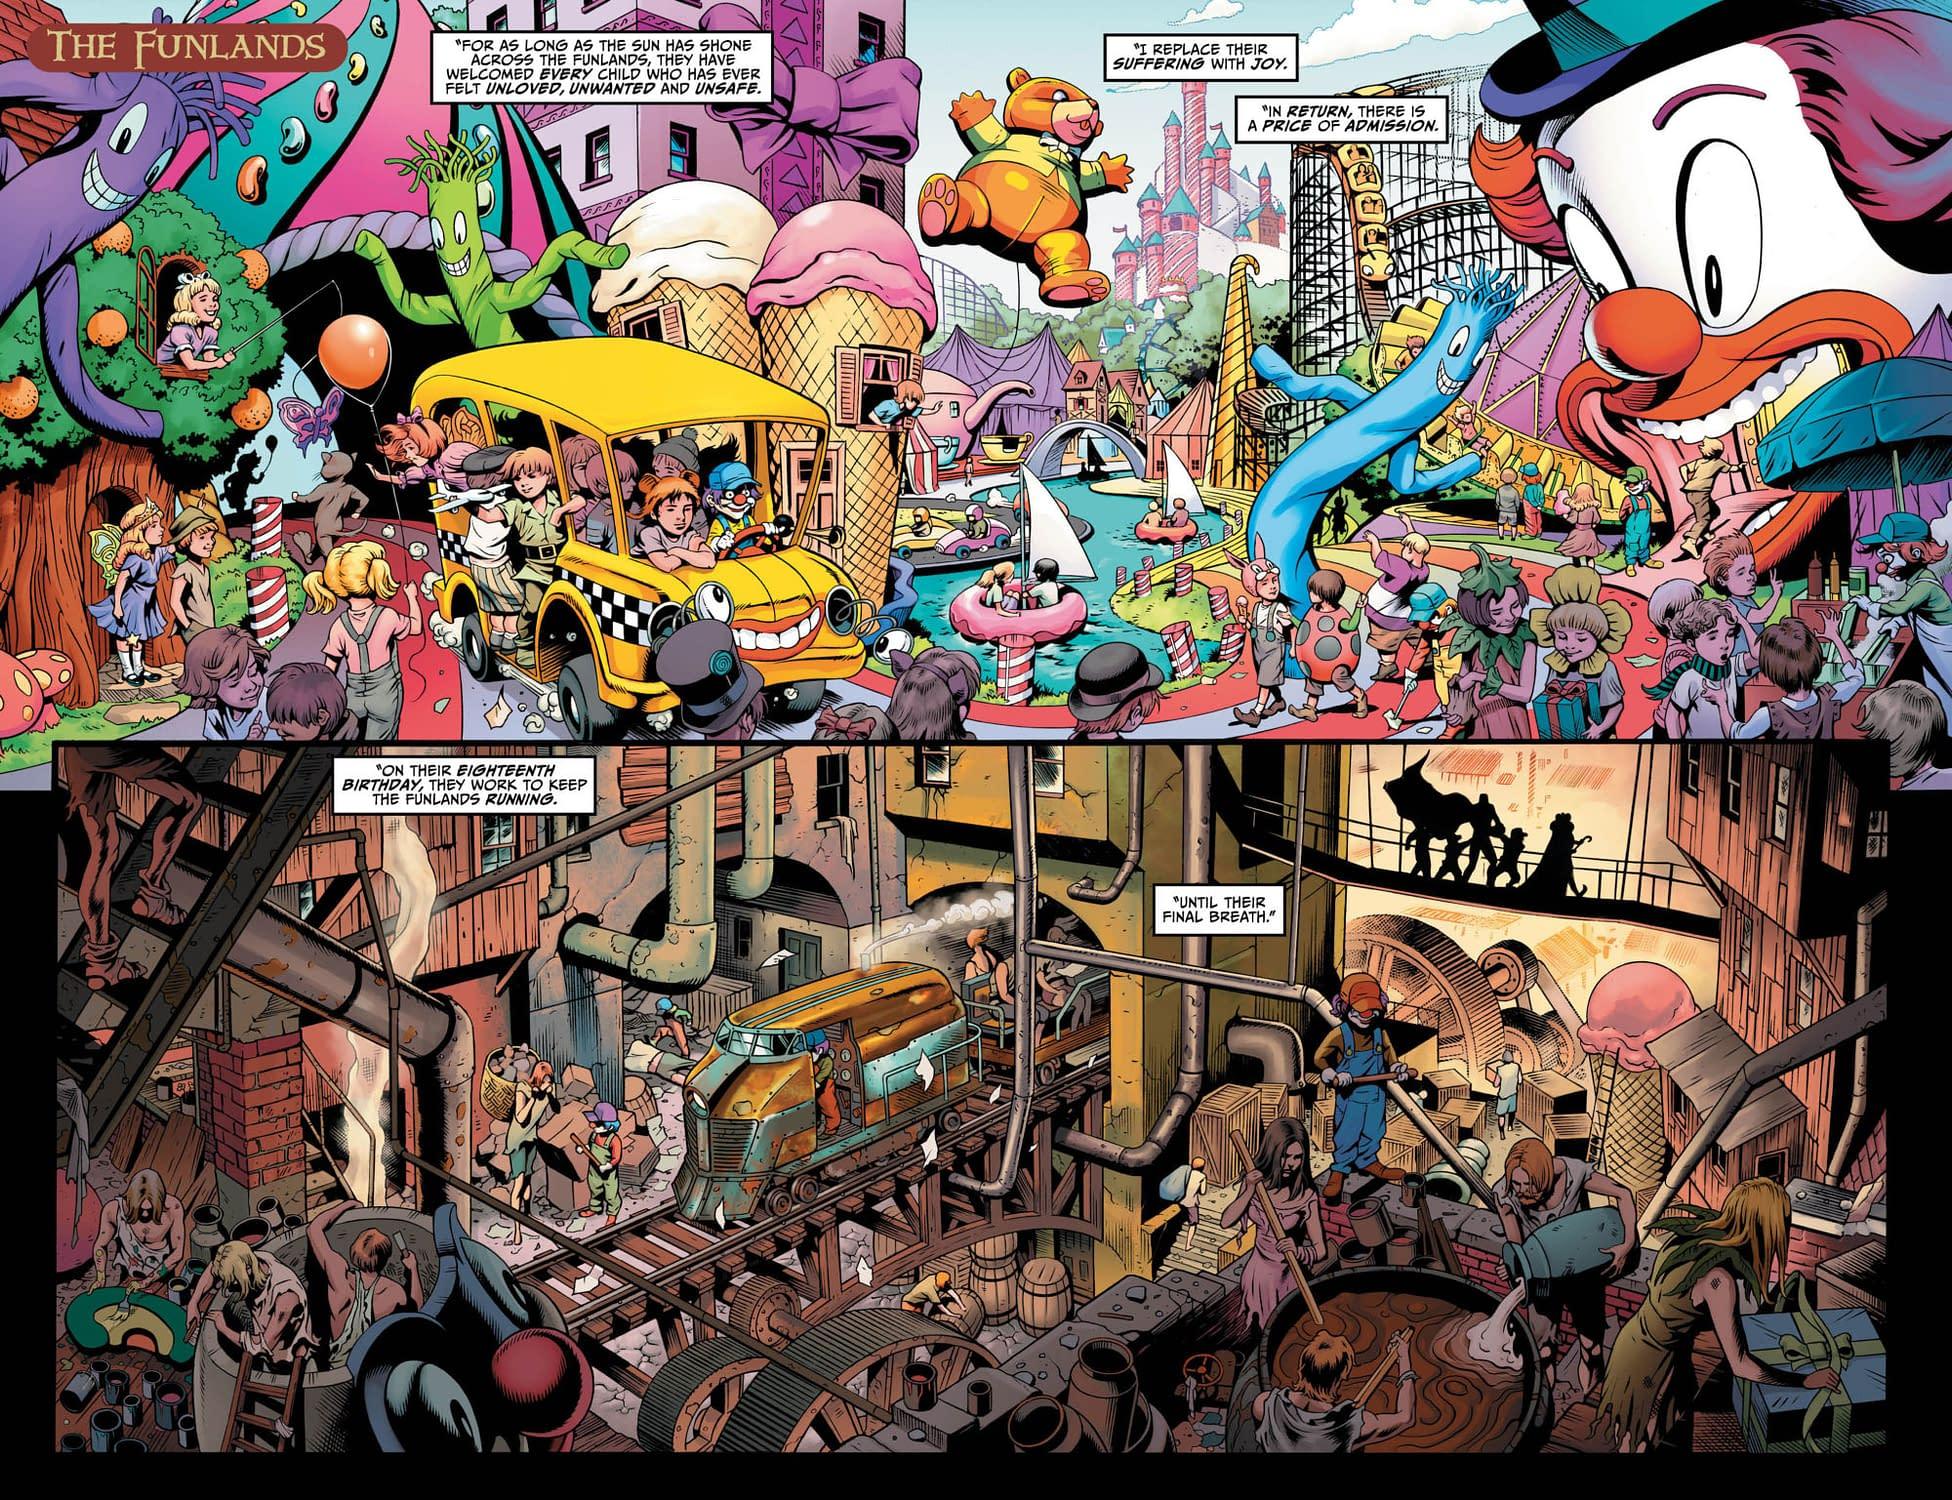 Black Adam Returns in This Shazam #5 Preview